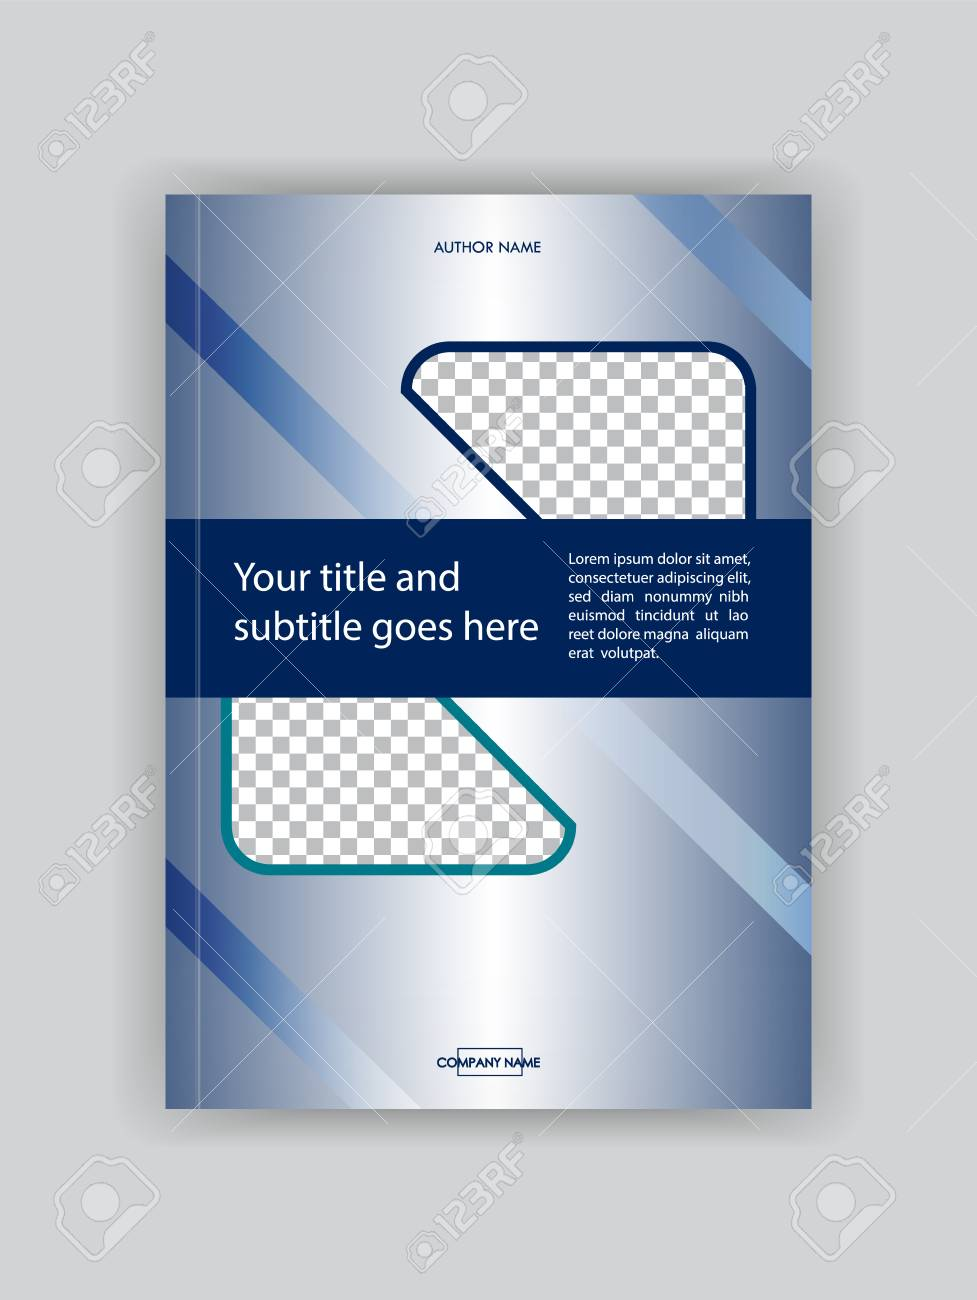 Business Book Cover Design Template Good For Portfolio Brochure